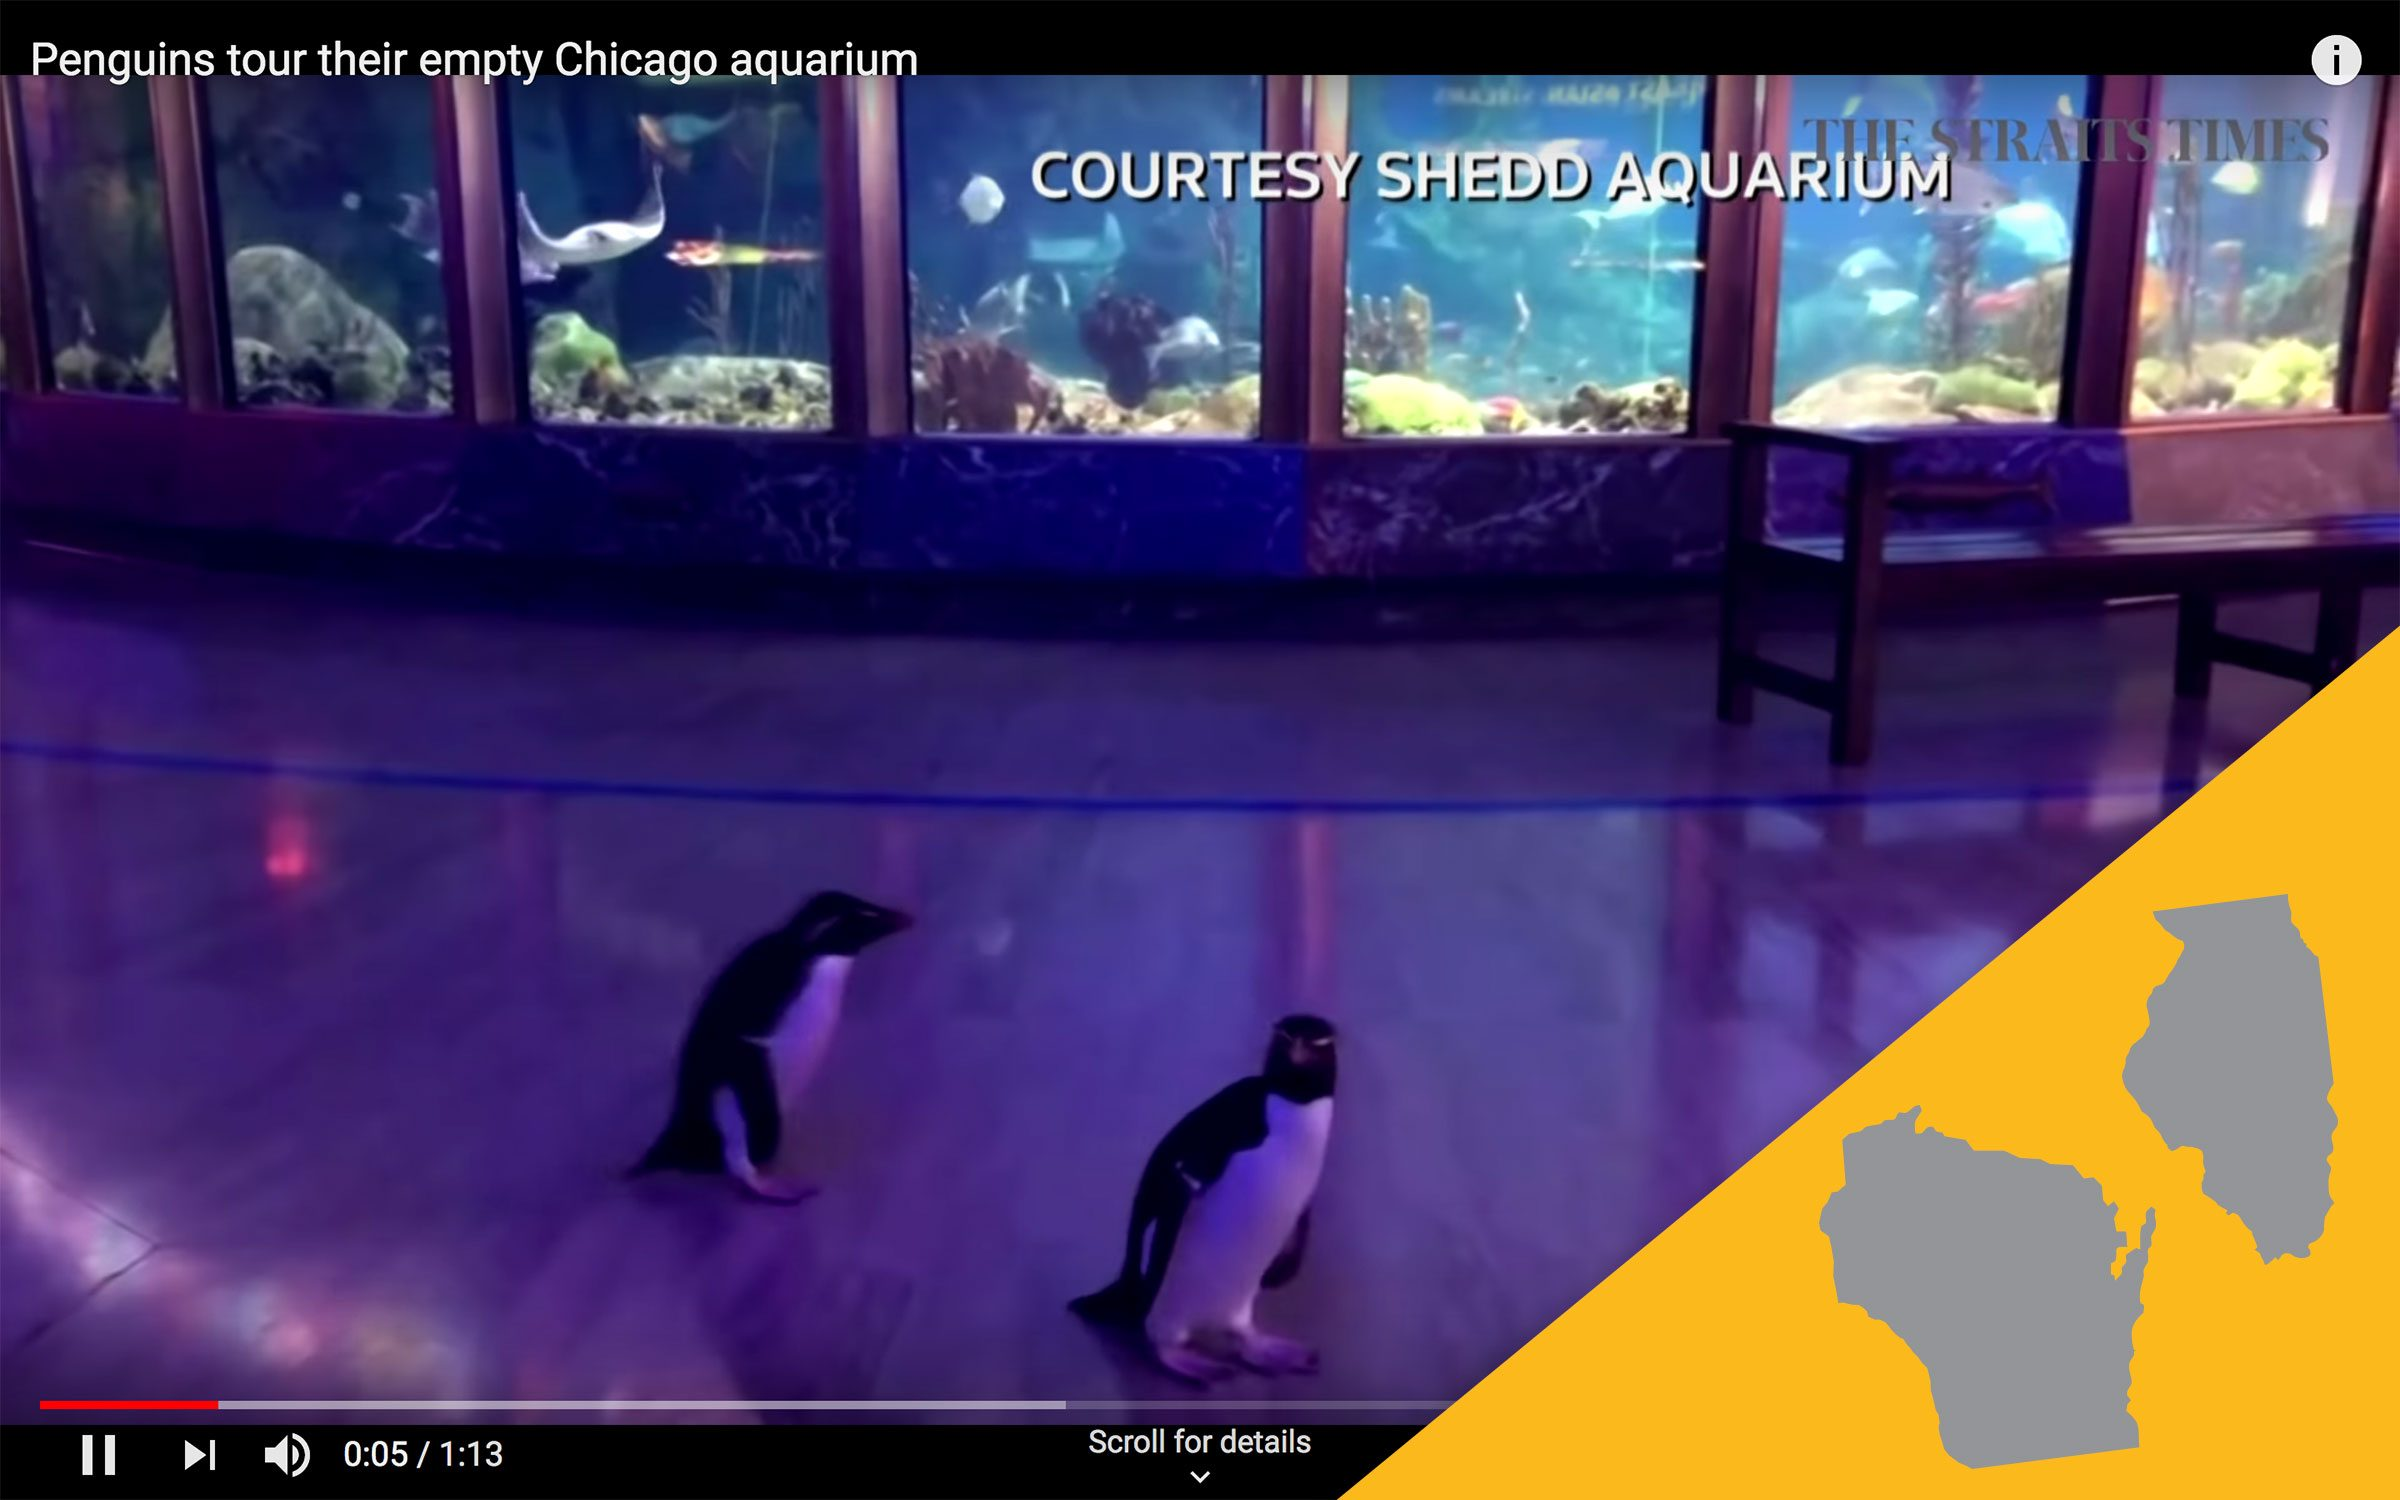 Shedd Aquarium virtual tour